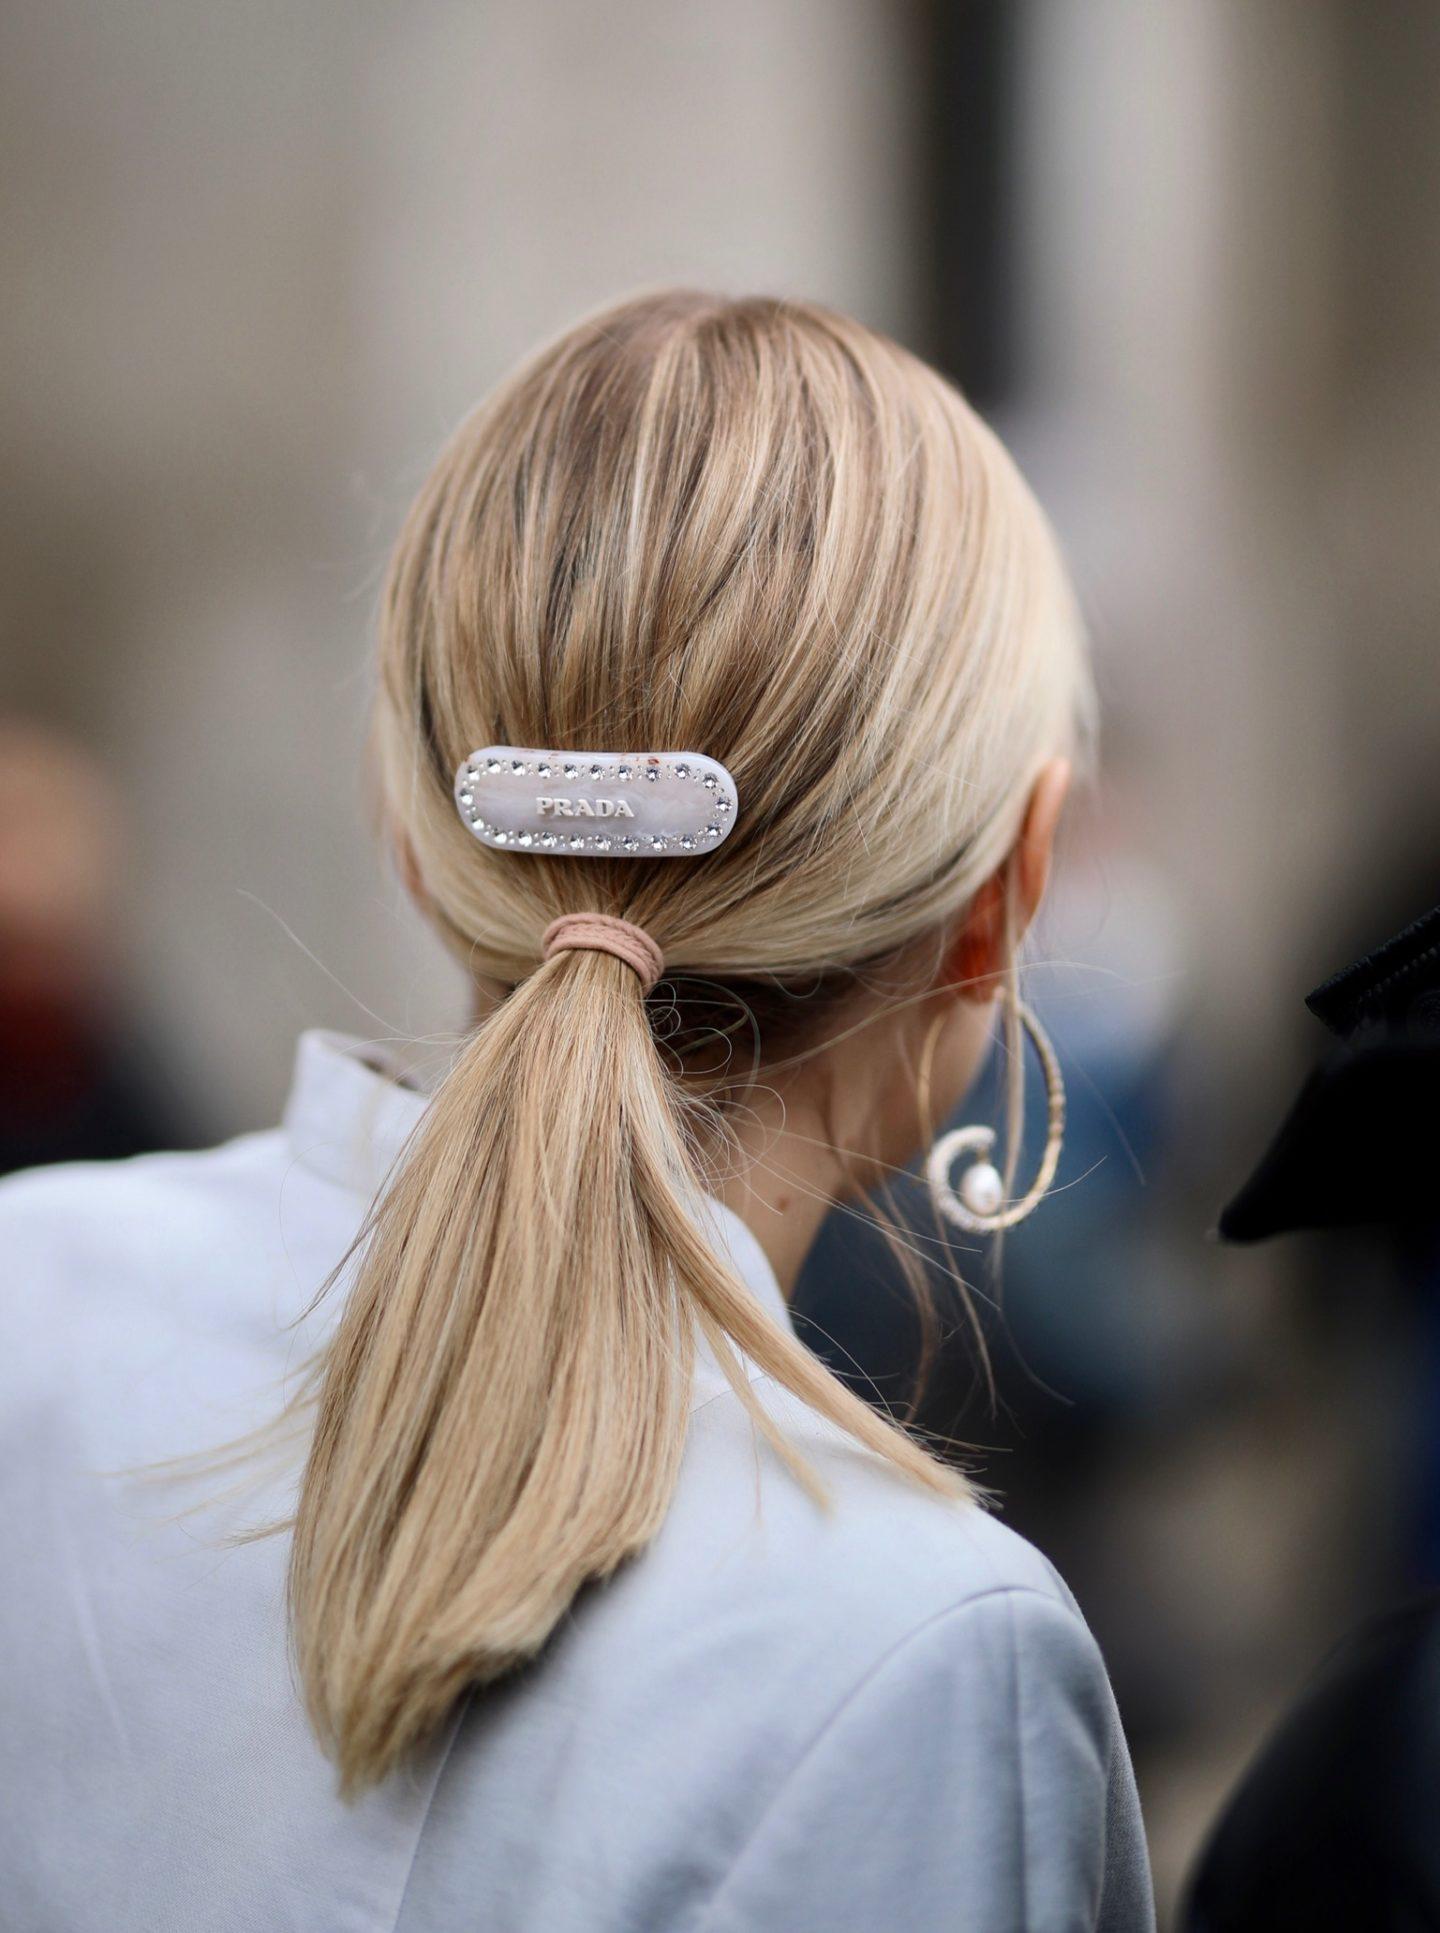 Prada white hair clip